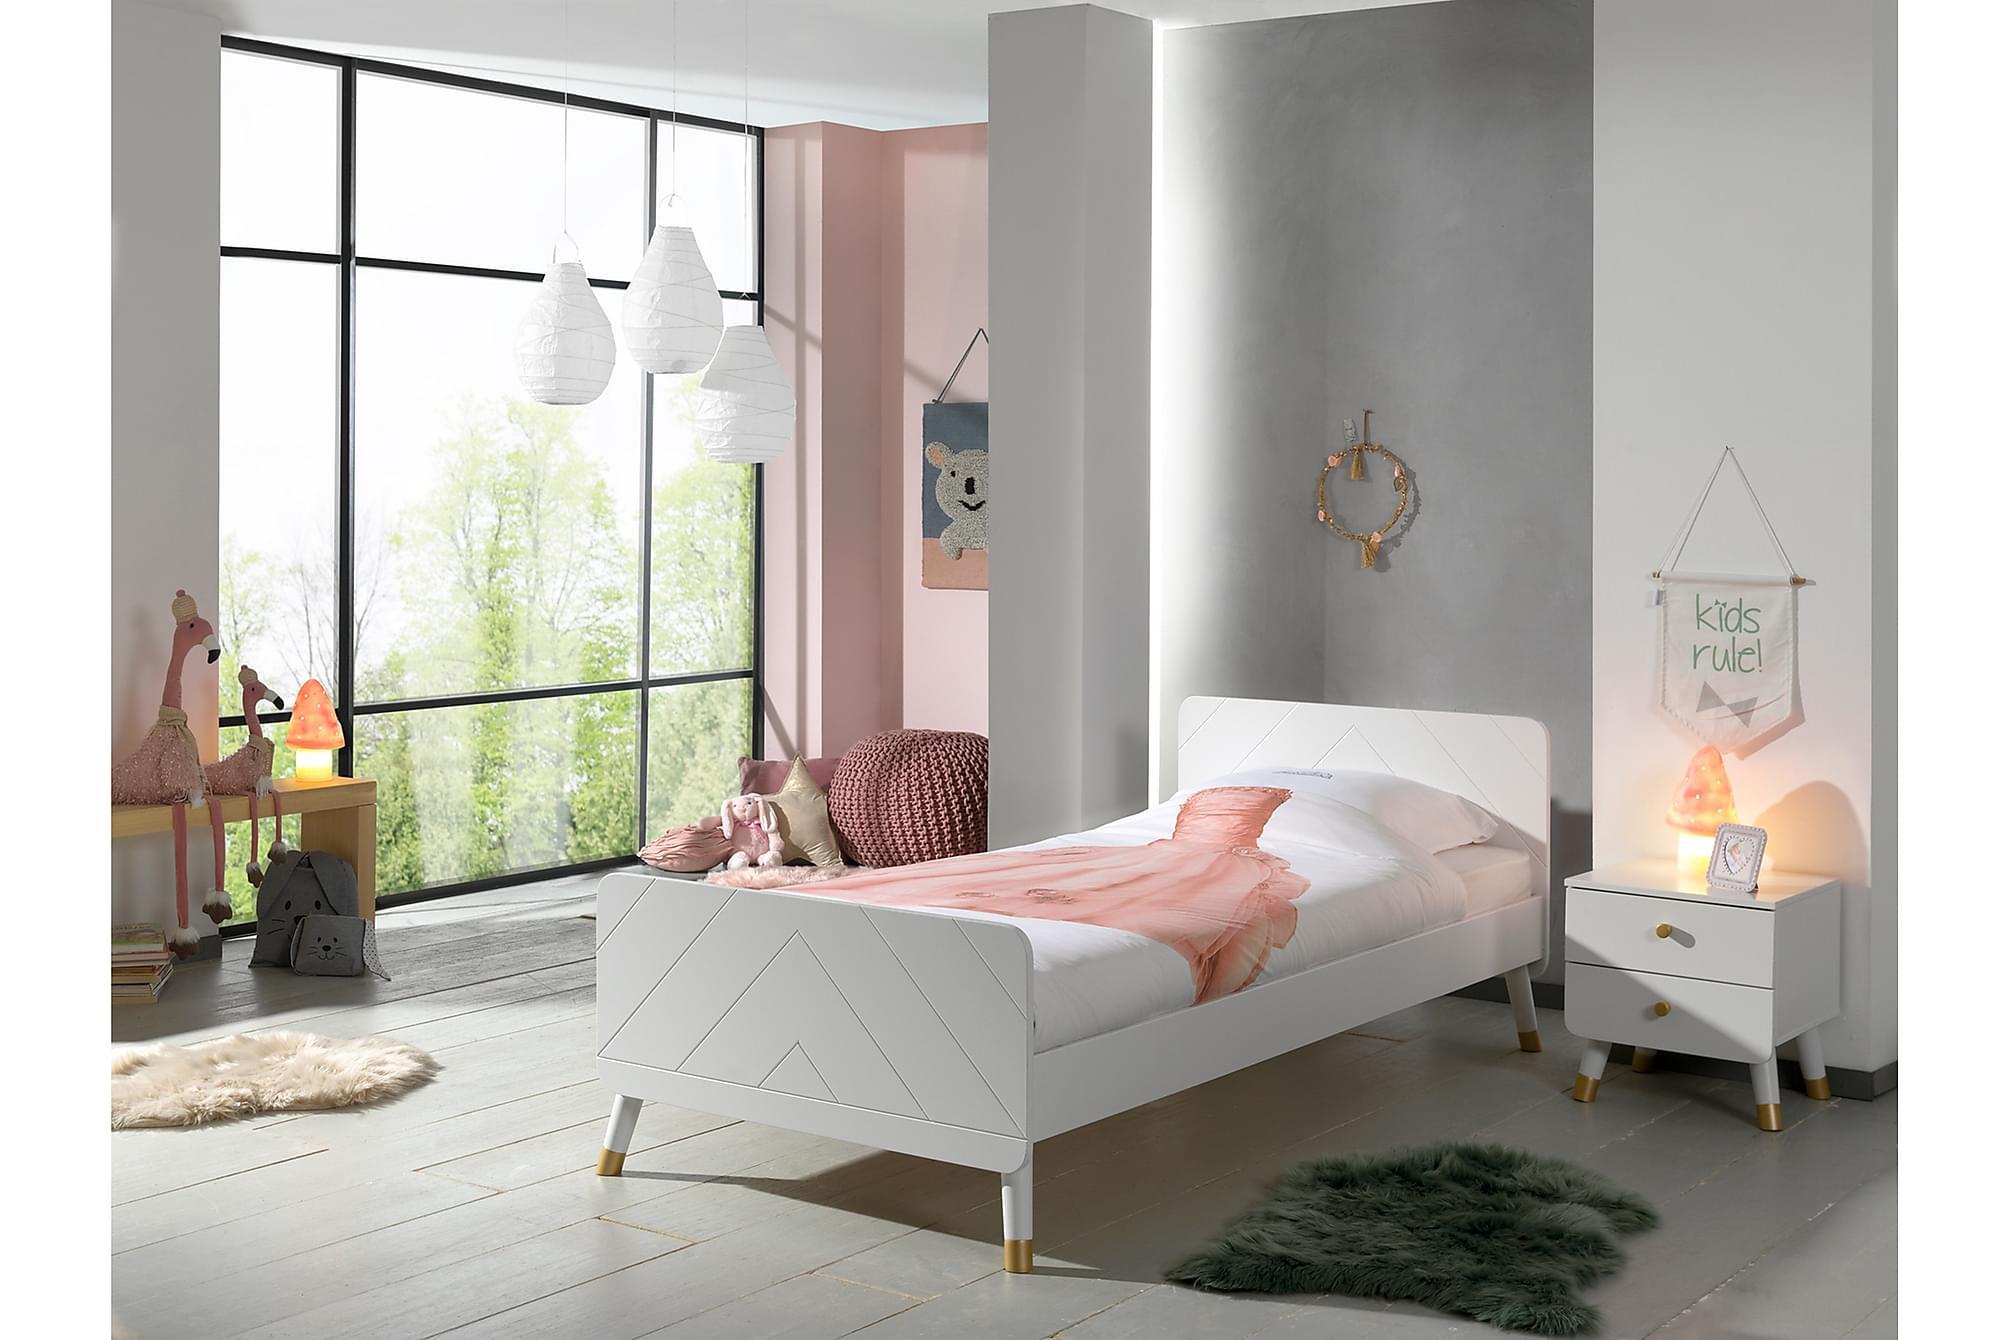 ARLUM Barnmöbelset Vit, Möbelset för sovrum